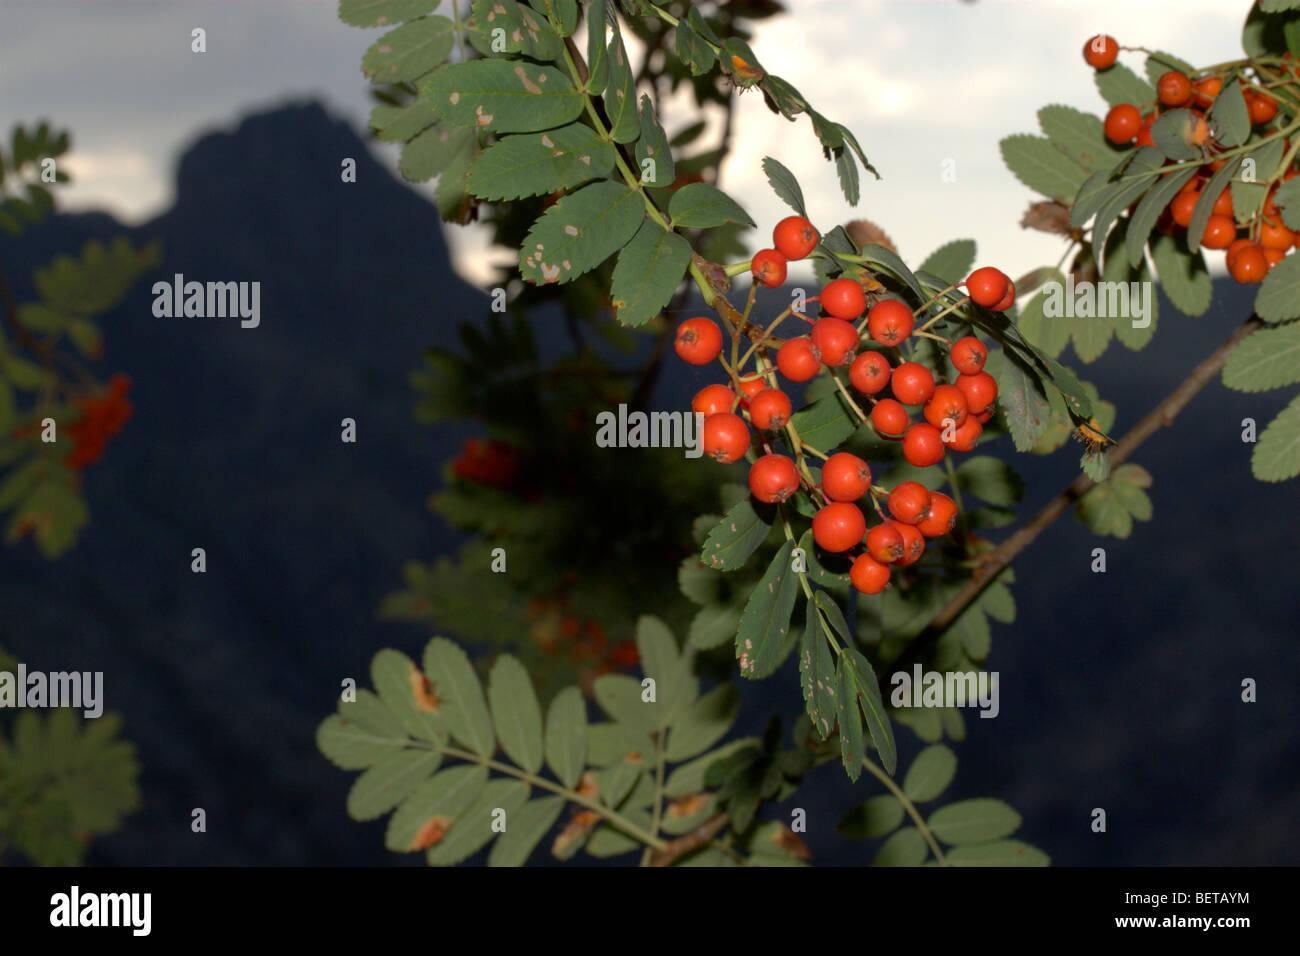 Rowan o Unione Rowan (Sorbus aucuparia) Immagini Stock